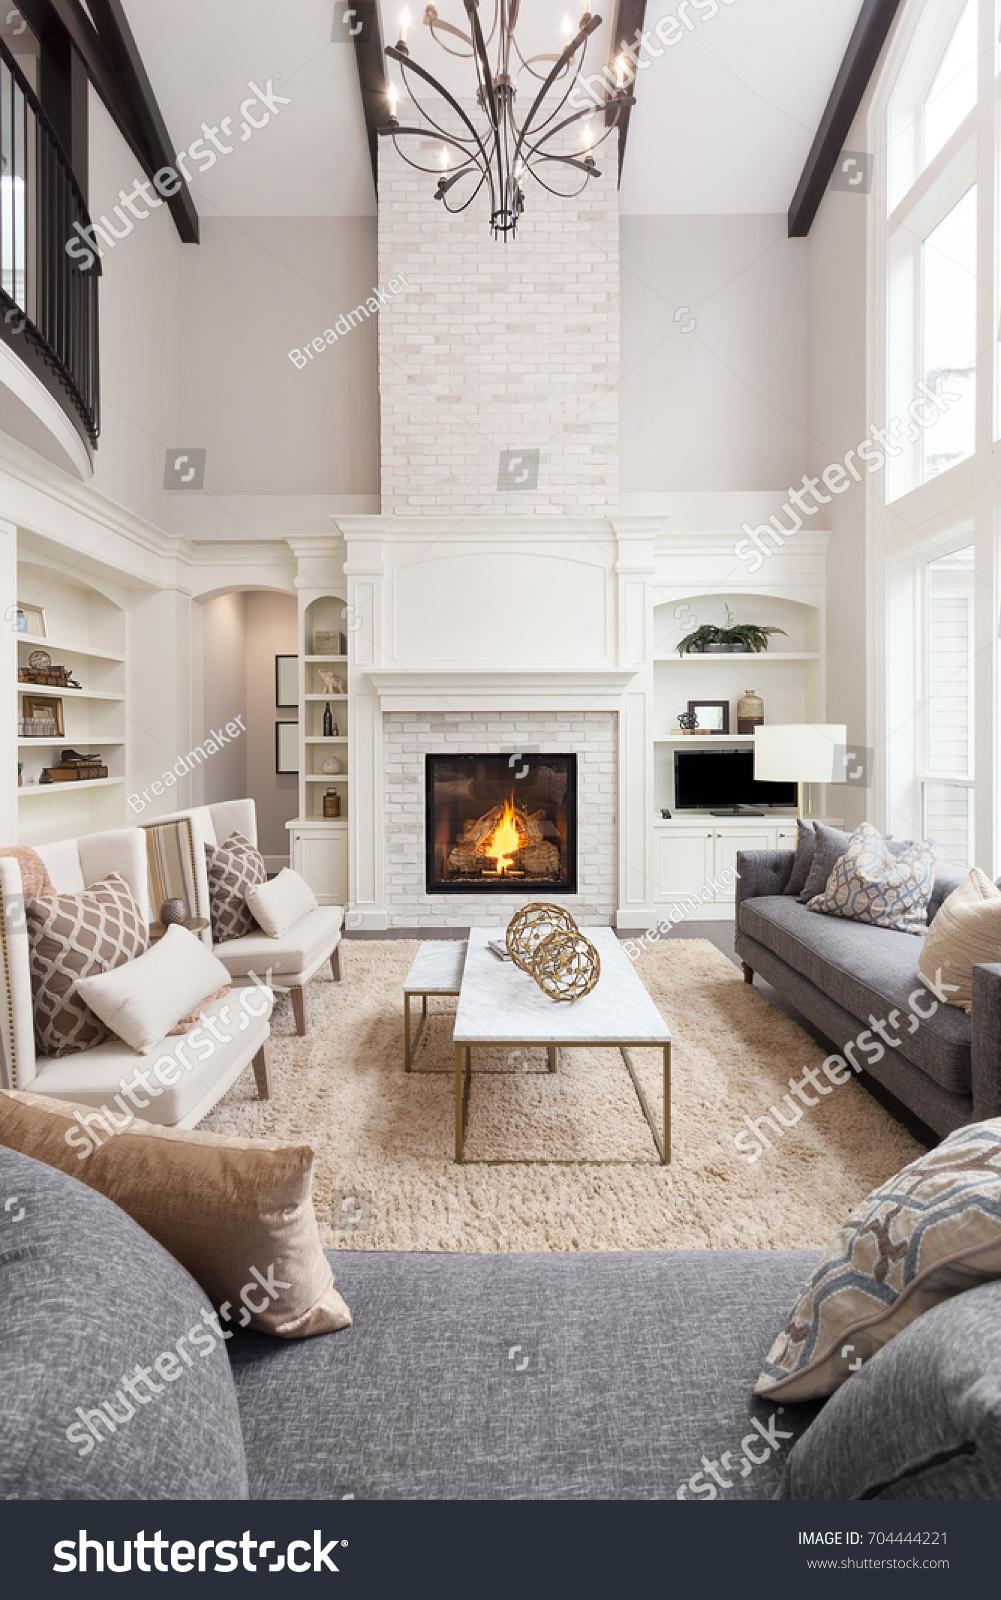 Beautiful Living Room Interior Hardwood Floors Stock Photo (Royalty ...